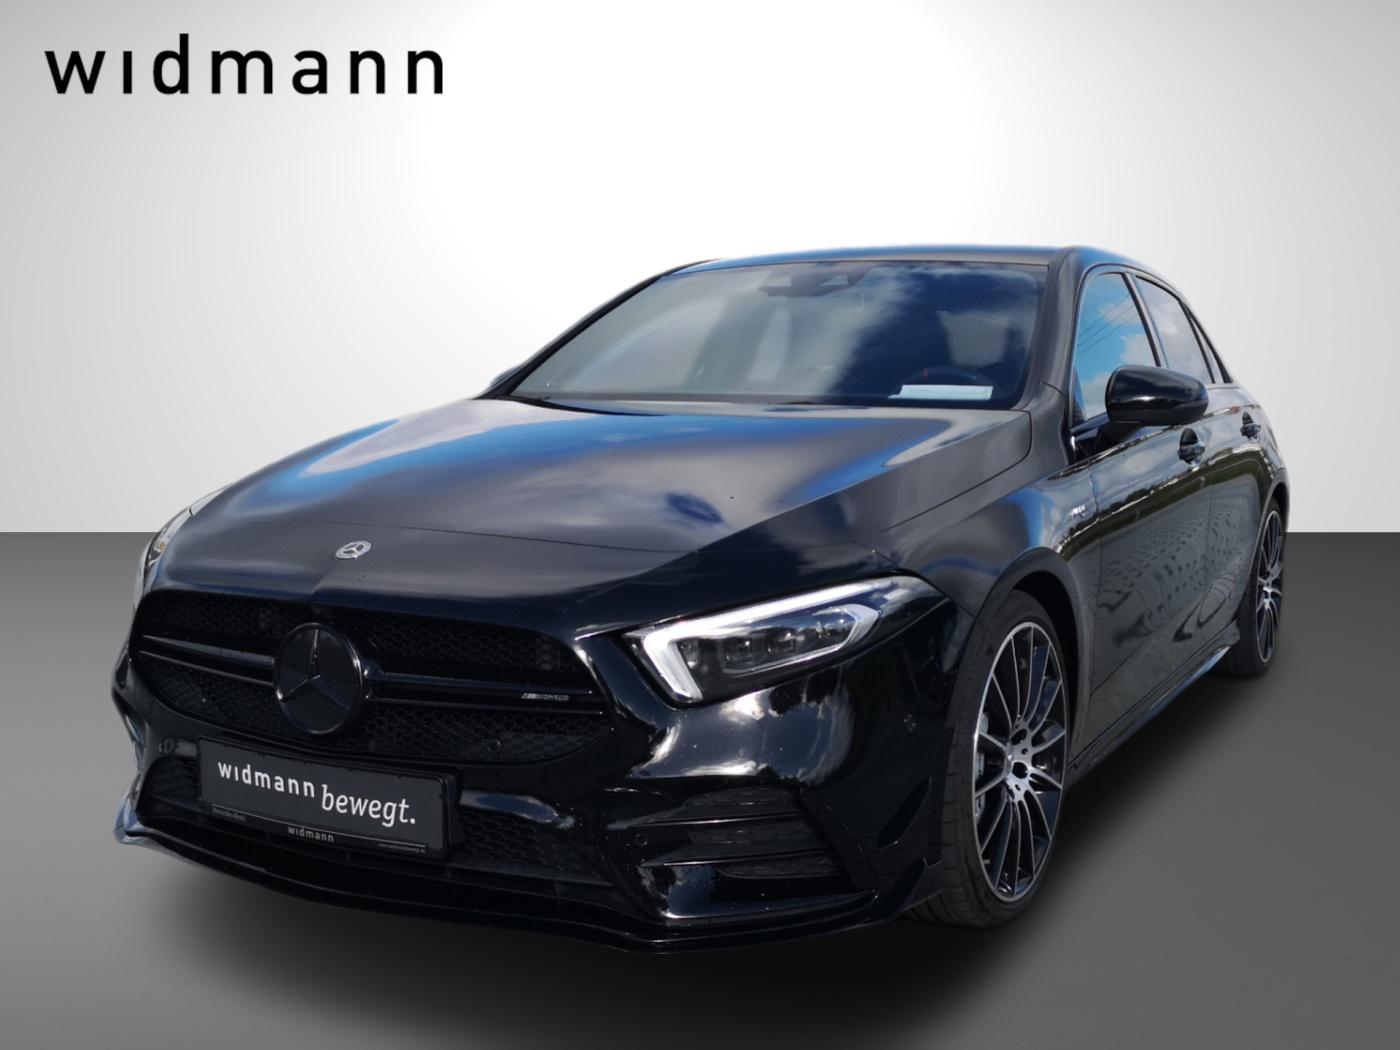 Mercedes-Benz A 35 AMG 4M *Burmester*360°*Multibeam*MBUX Augm., Jahr 2019, Benzin